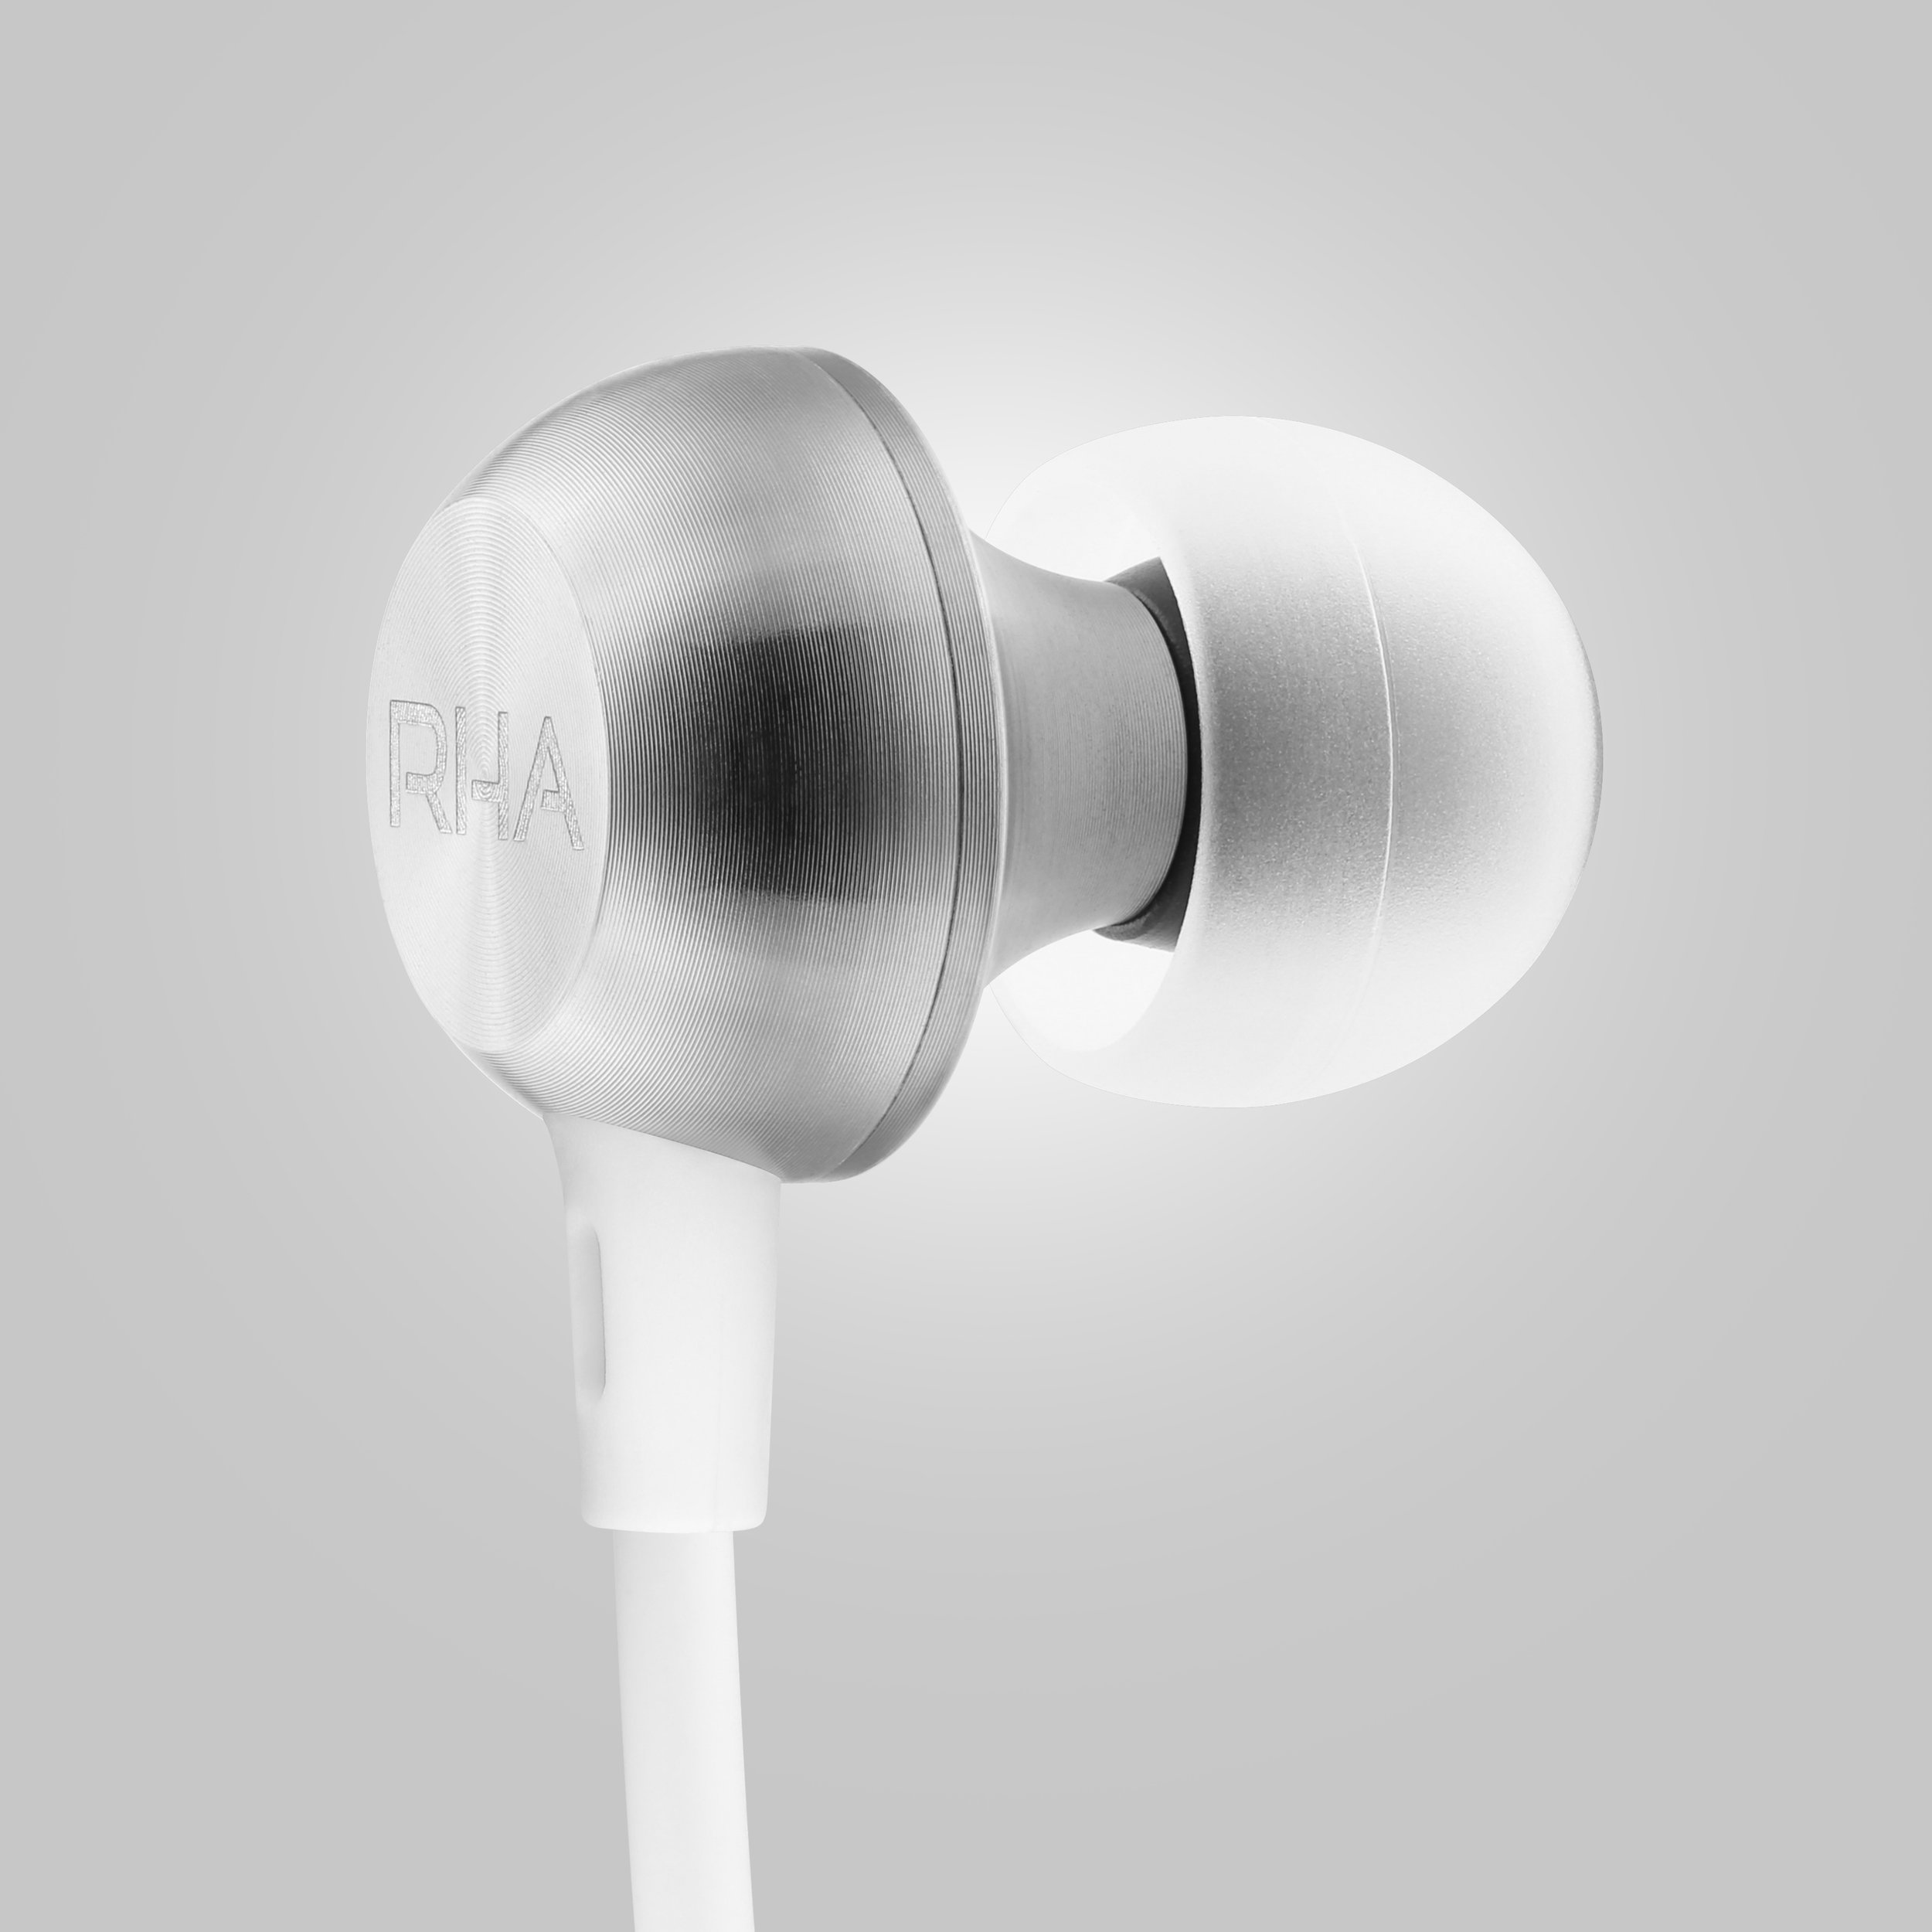 MA650 Wireless White - Housing Front (on Grey).jpg